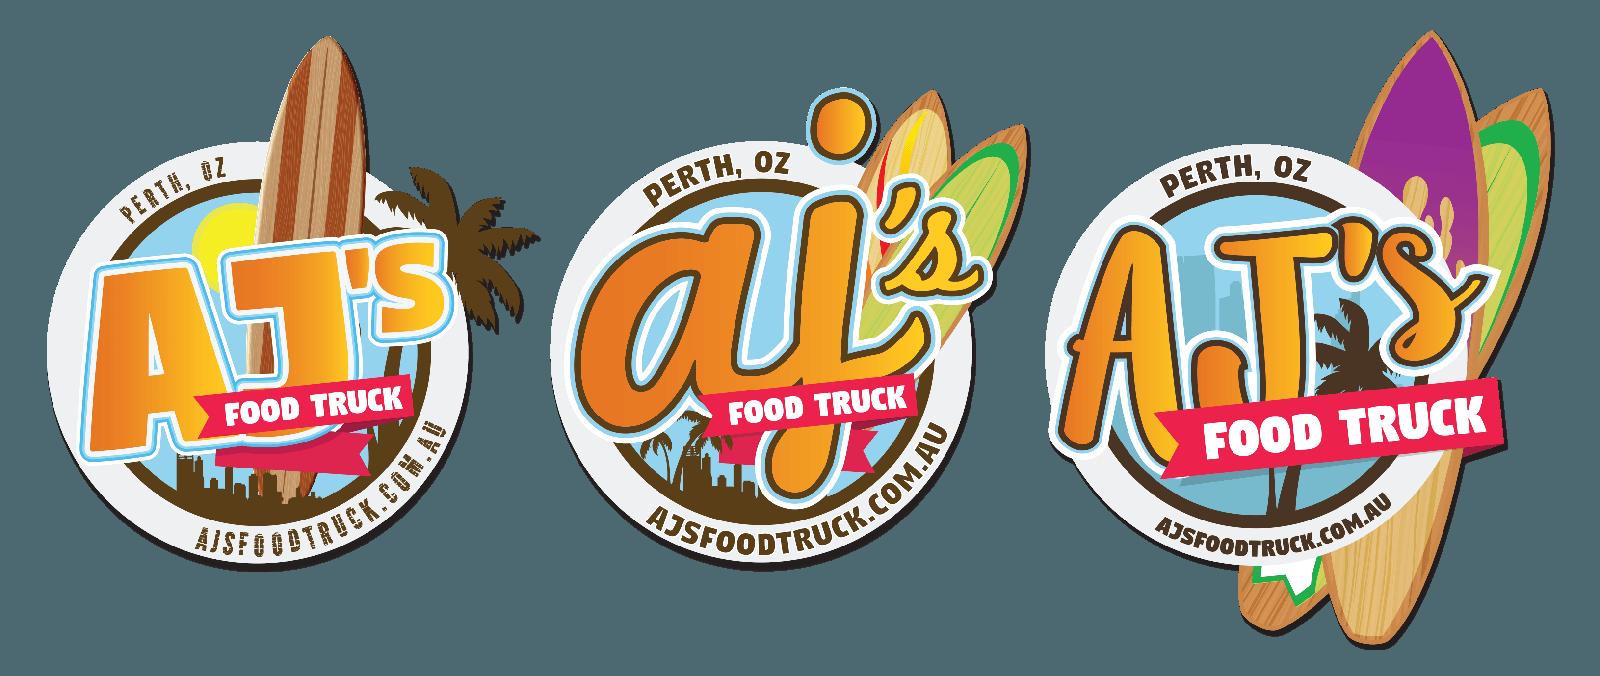 aj's food truck design branding concepts